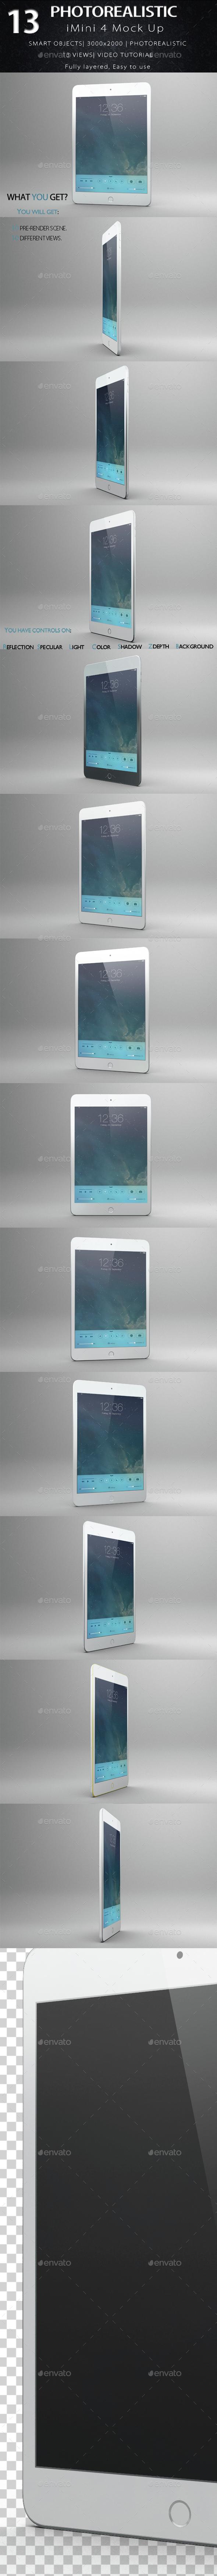 iMini 4 Mock Up 14 Views - Mobile Displays